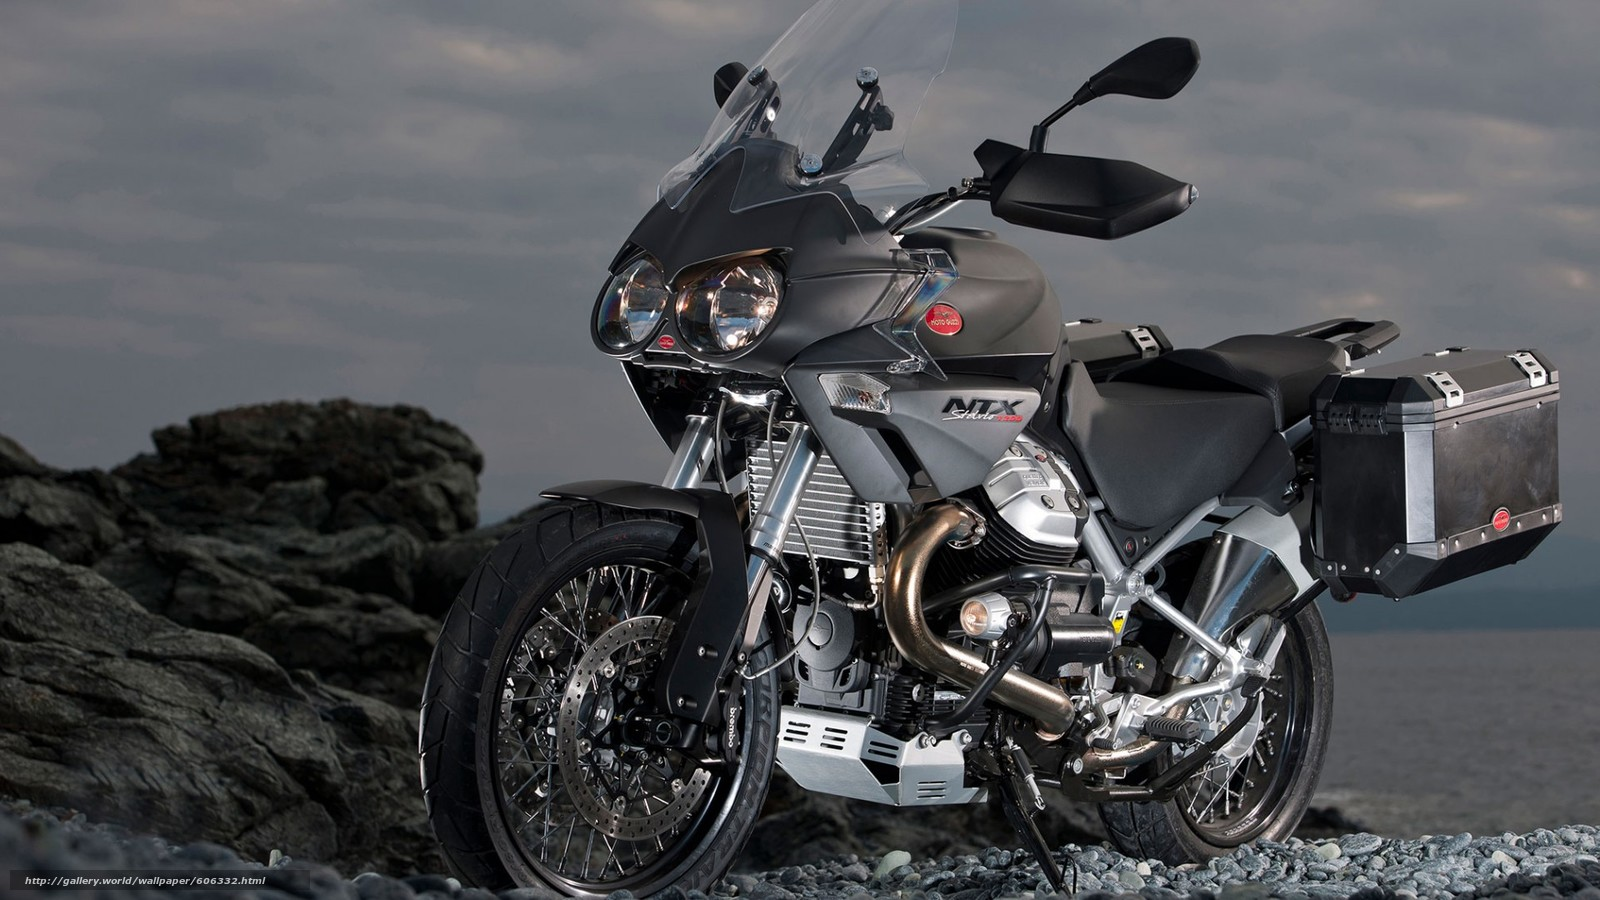 cruiser, Moto Guzzi, Stelvio 1200, NTX, bike